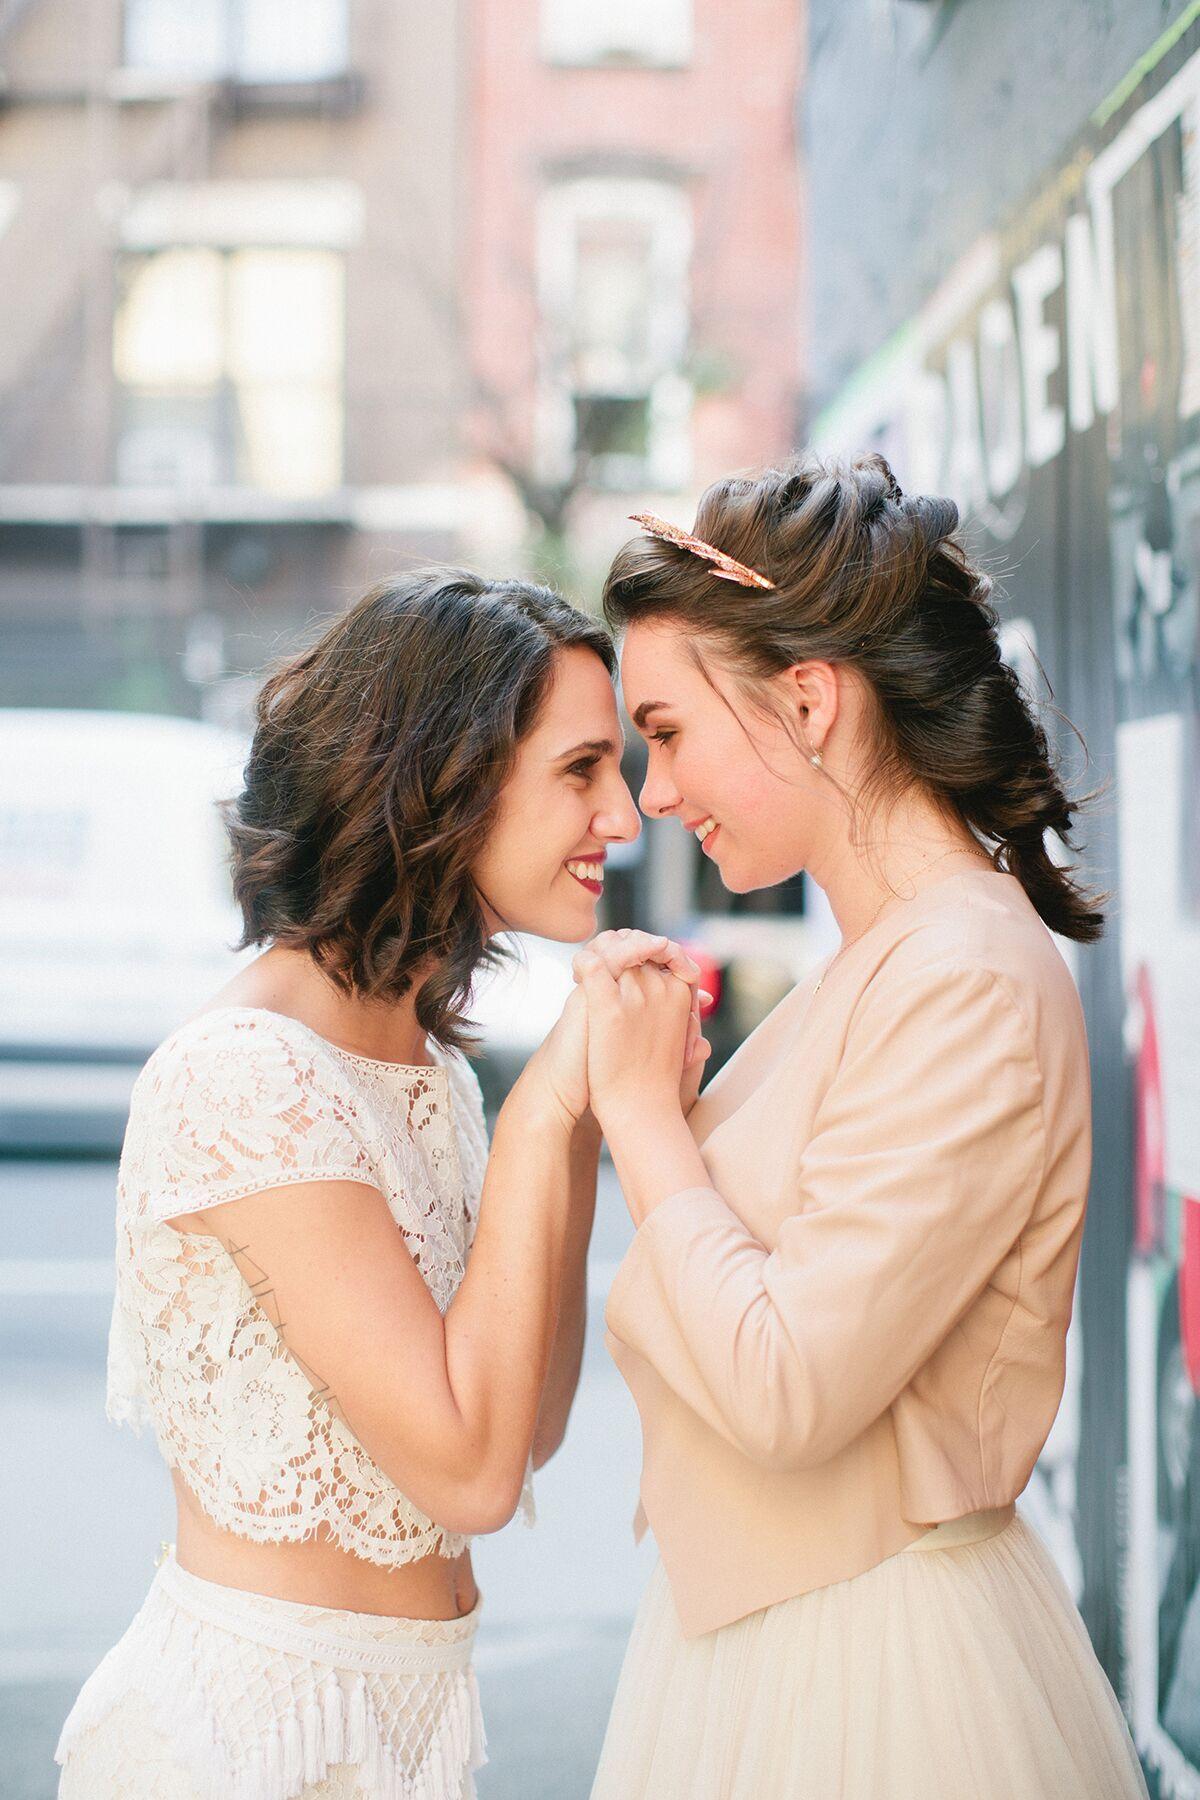 Urban Bohemian Wedding Inspiration | SouthBound Bride